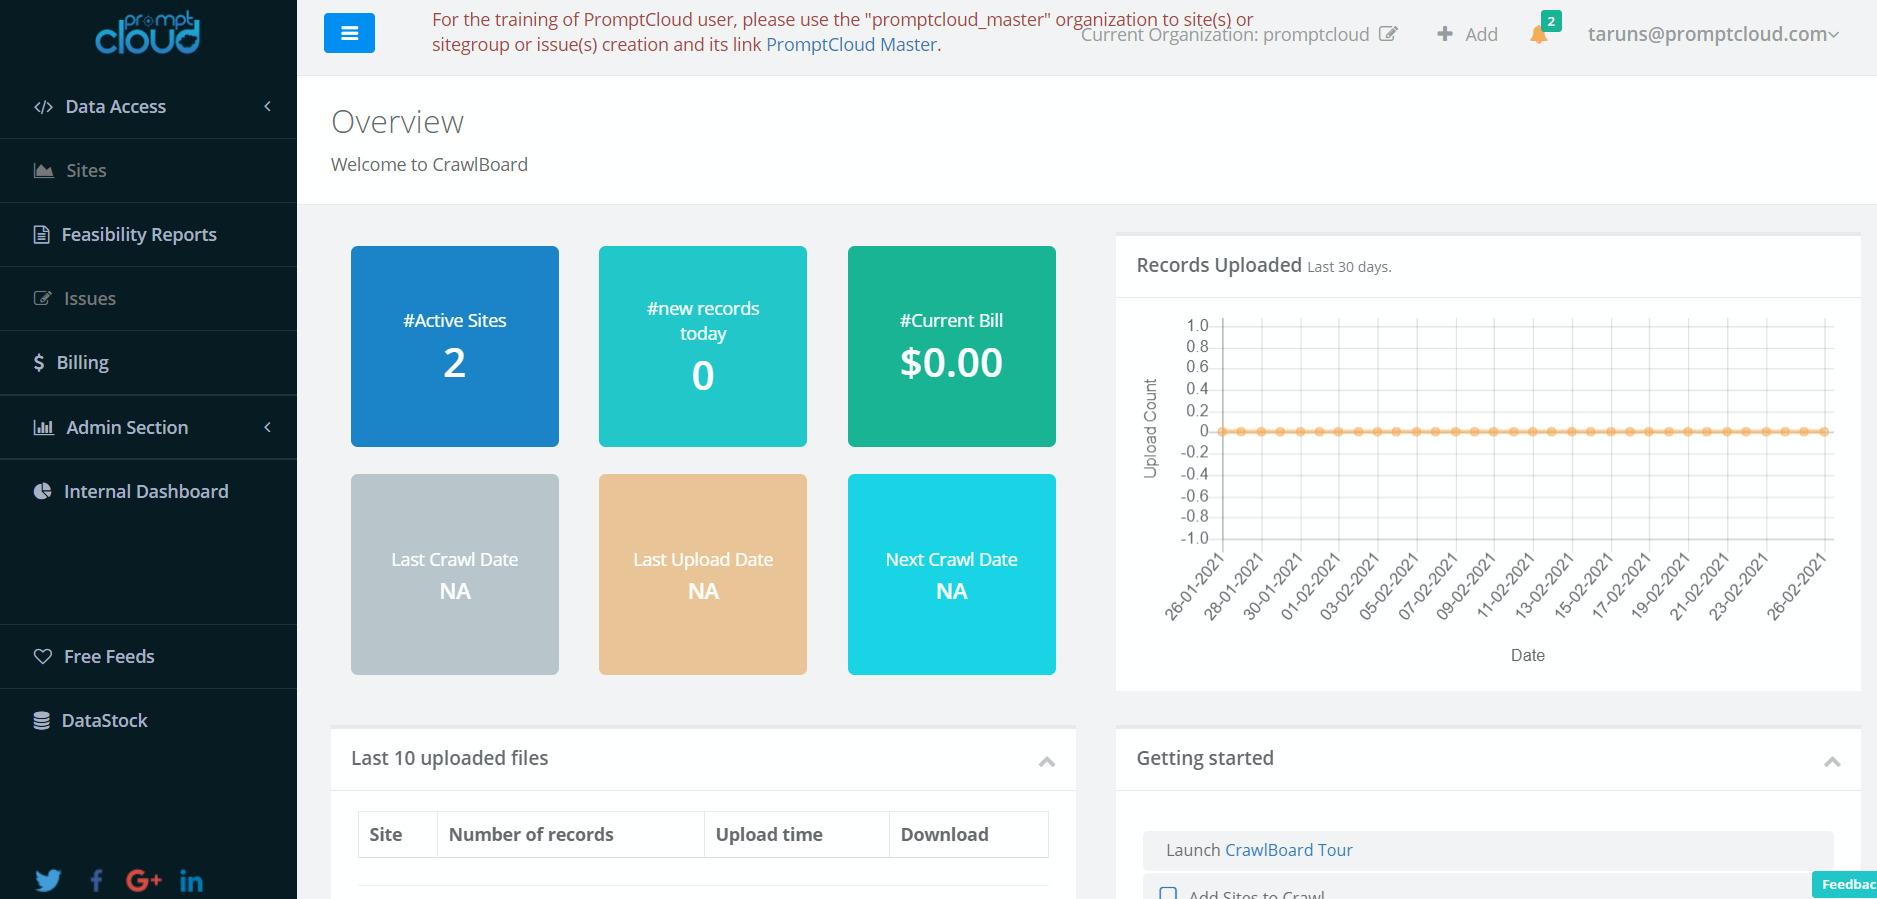 PromptCloud screenshot